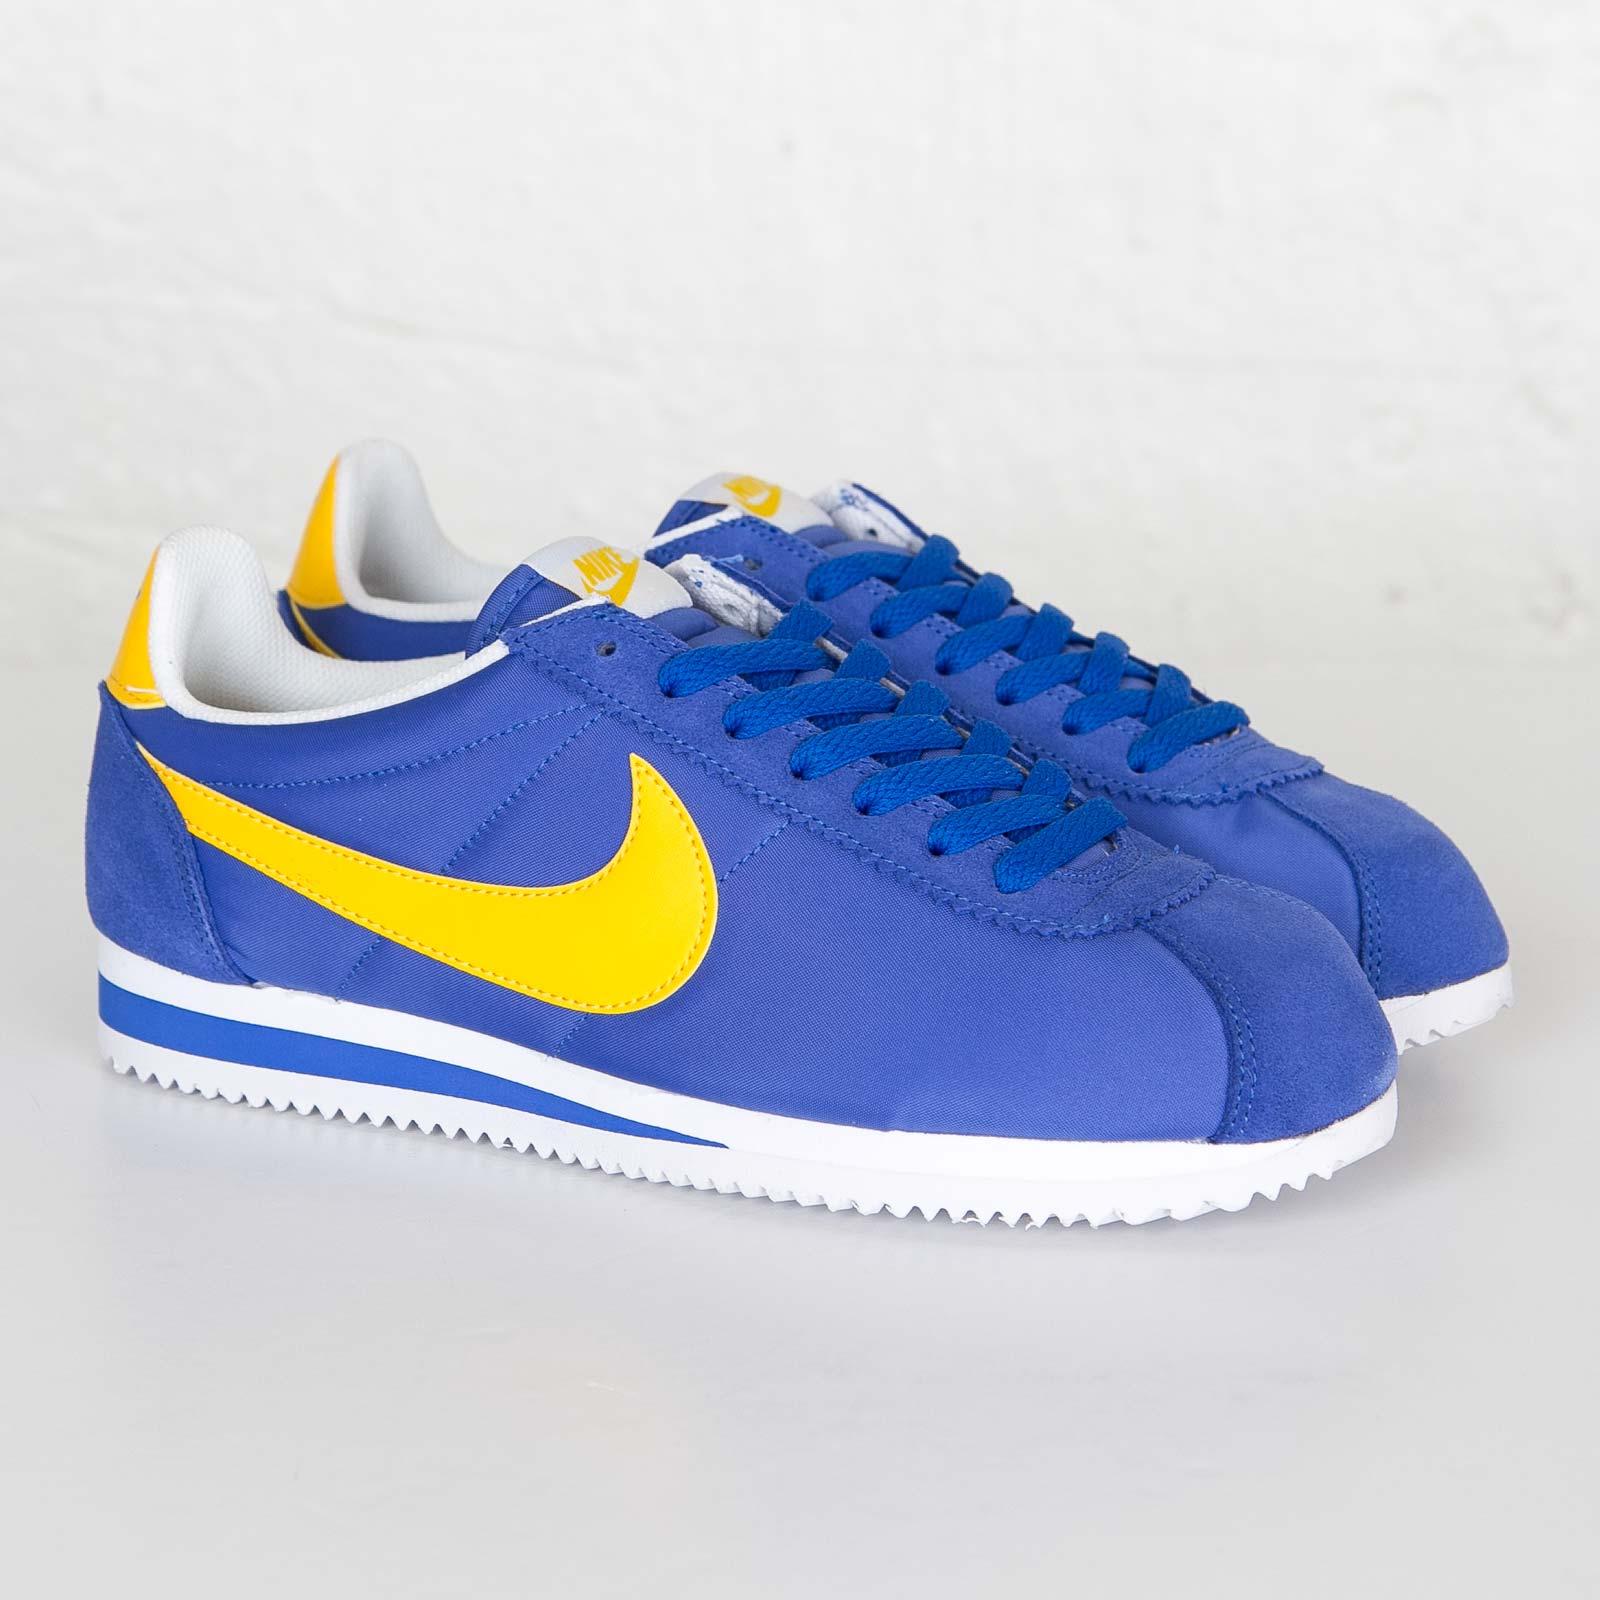 Nike Classic Chaussuressnstuff Cortez Nylon 807472 471 Chaussuressnstuff Classic Chaussuress 60668d